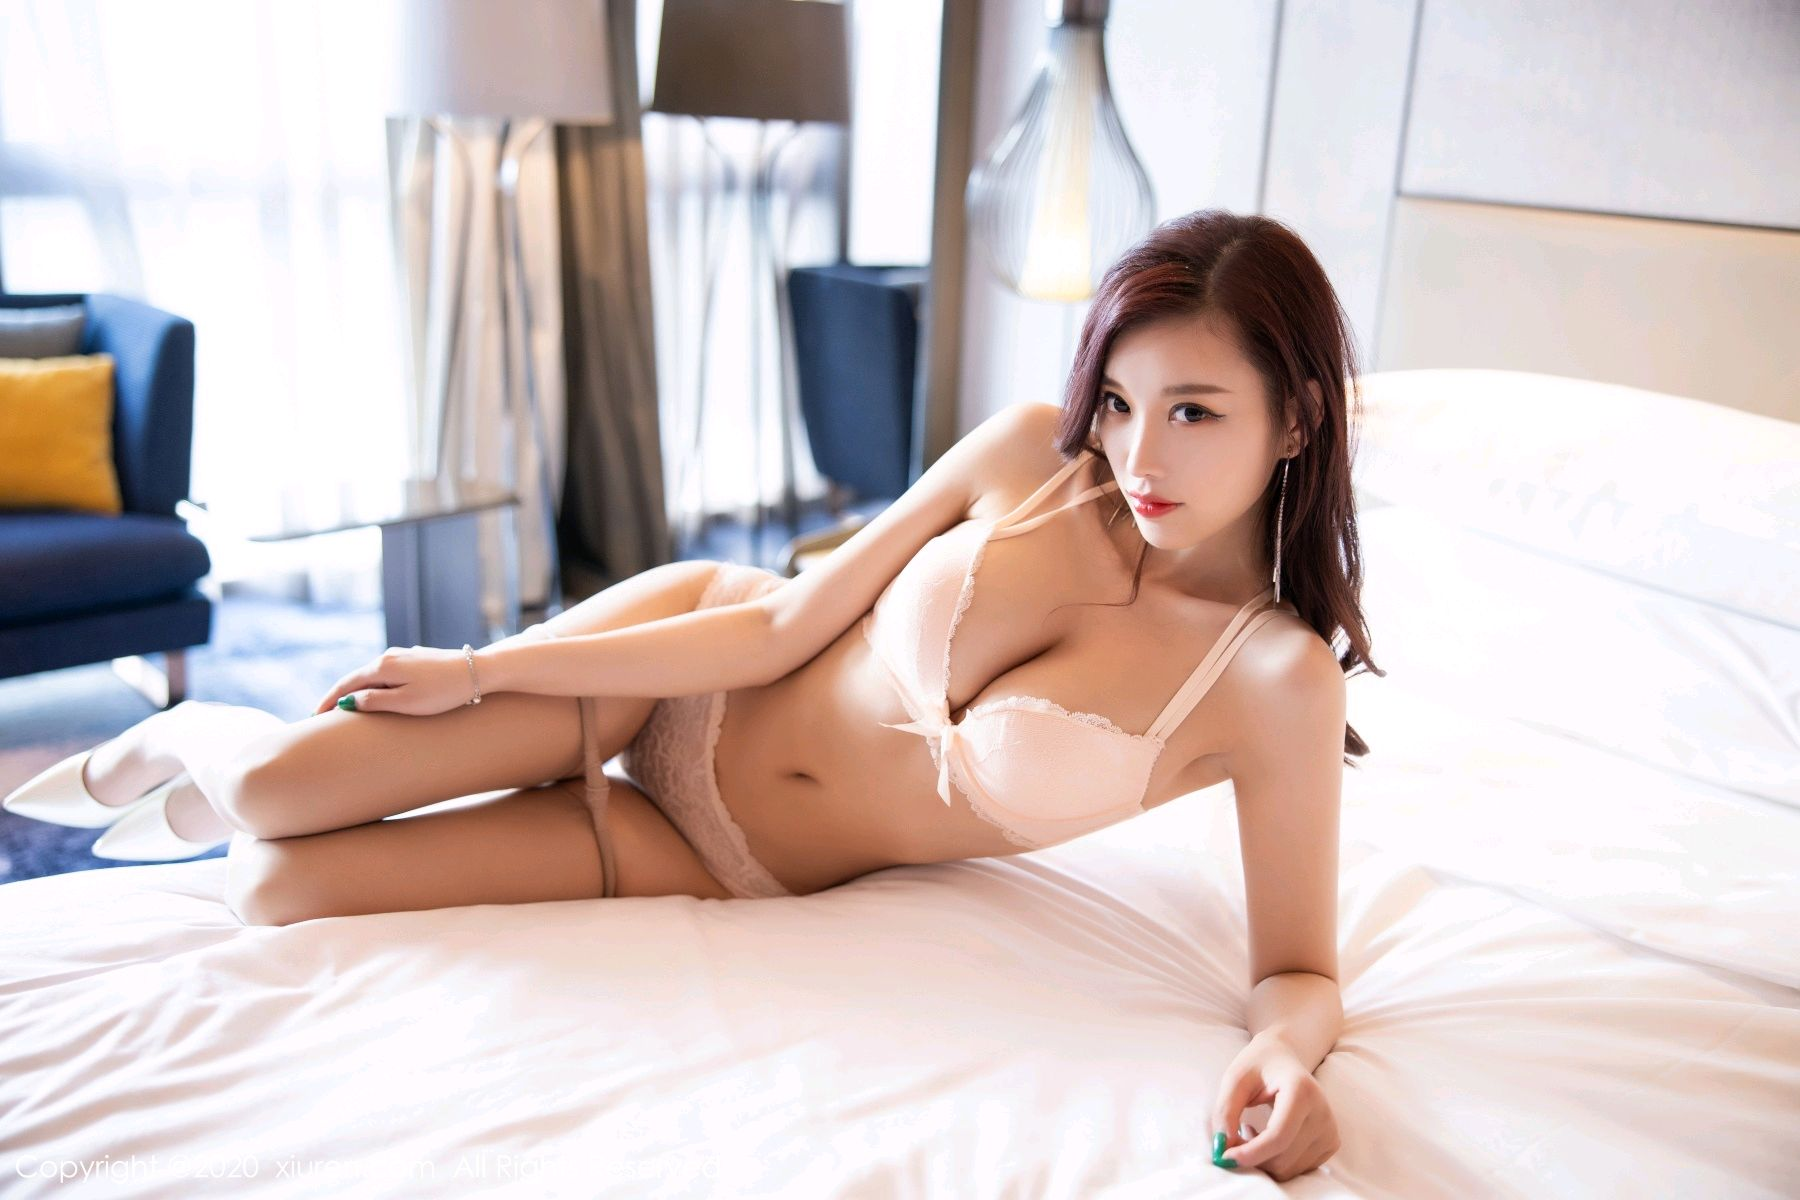 [XiuRen] Vol.2431 Yang Chen Chen 73P, Tall, Underwear, Uniform, Xiuren, Yang Chen Chen